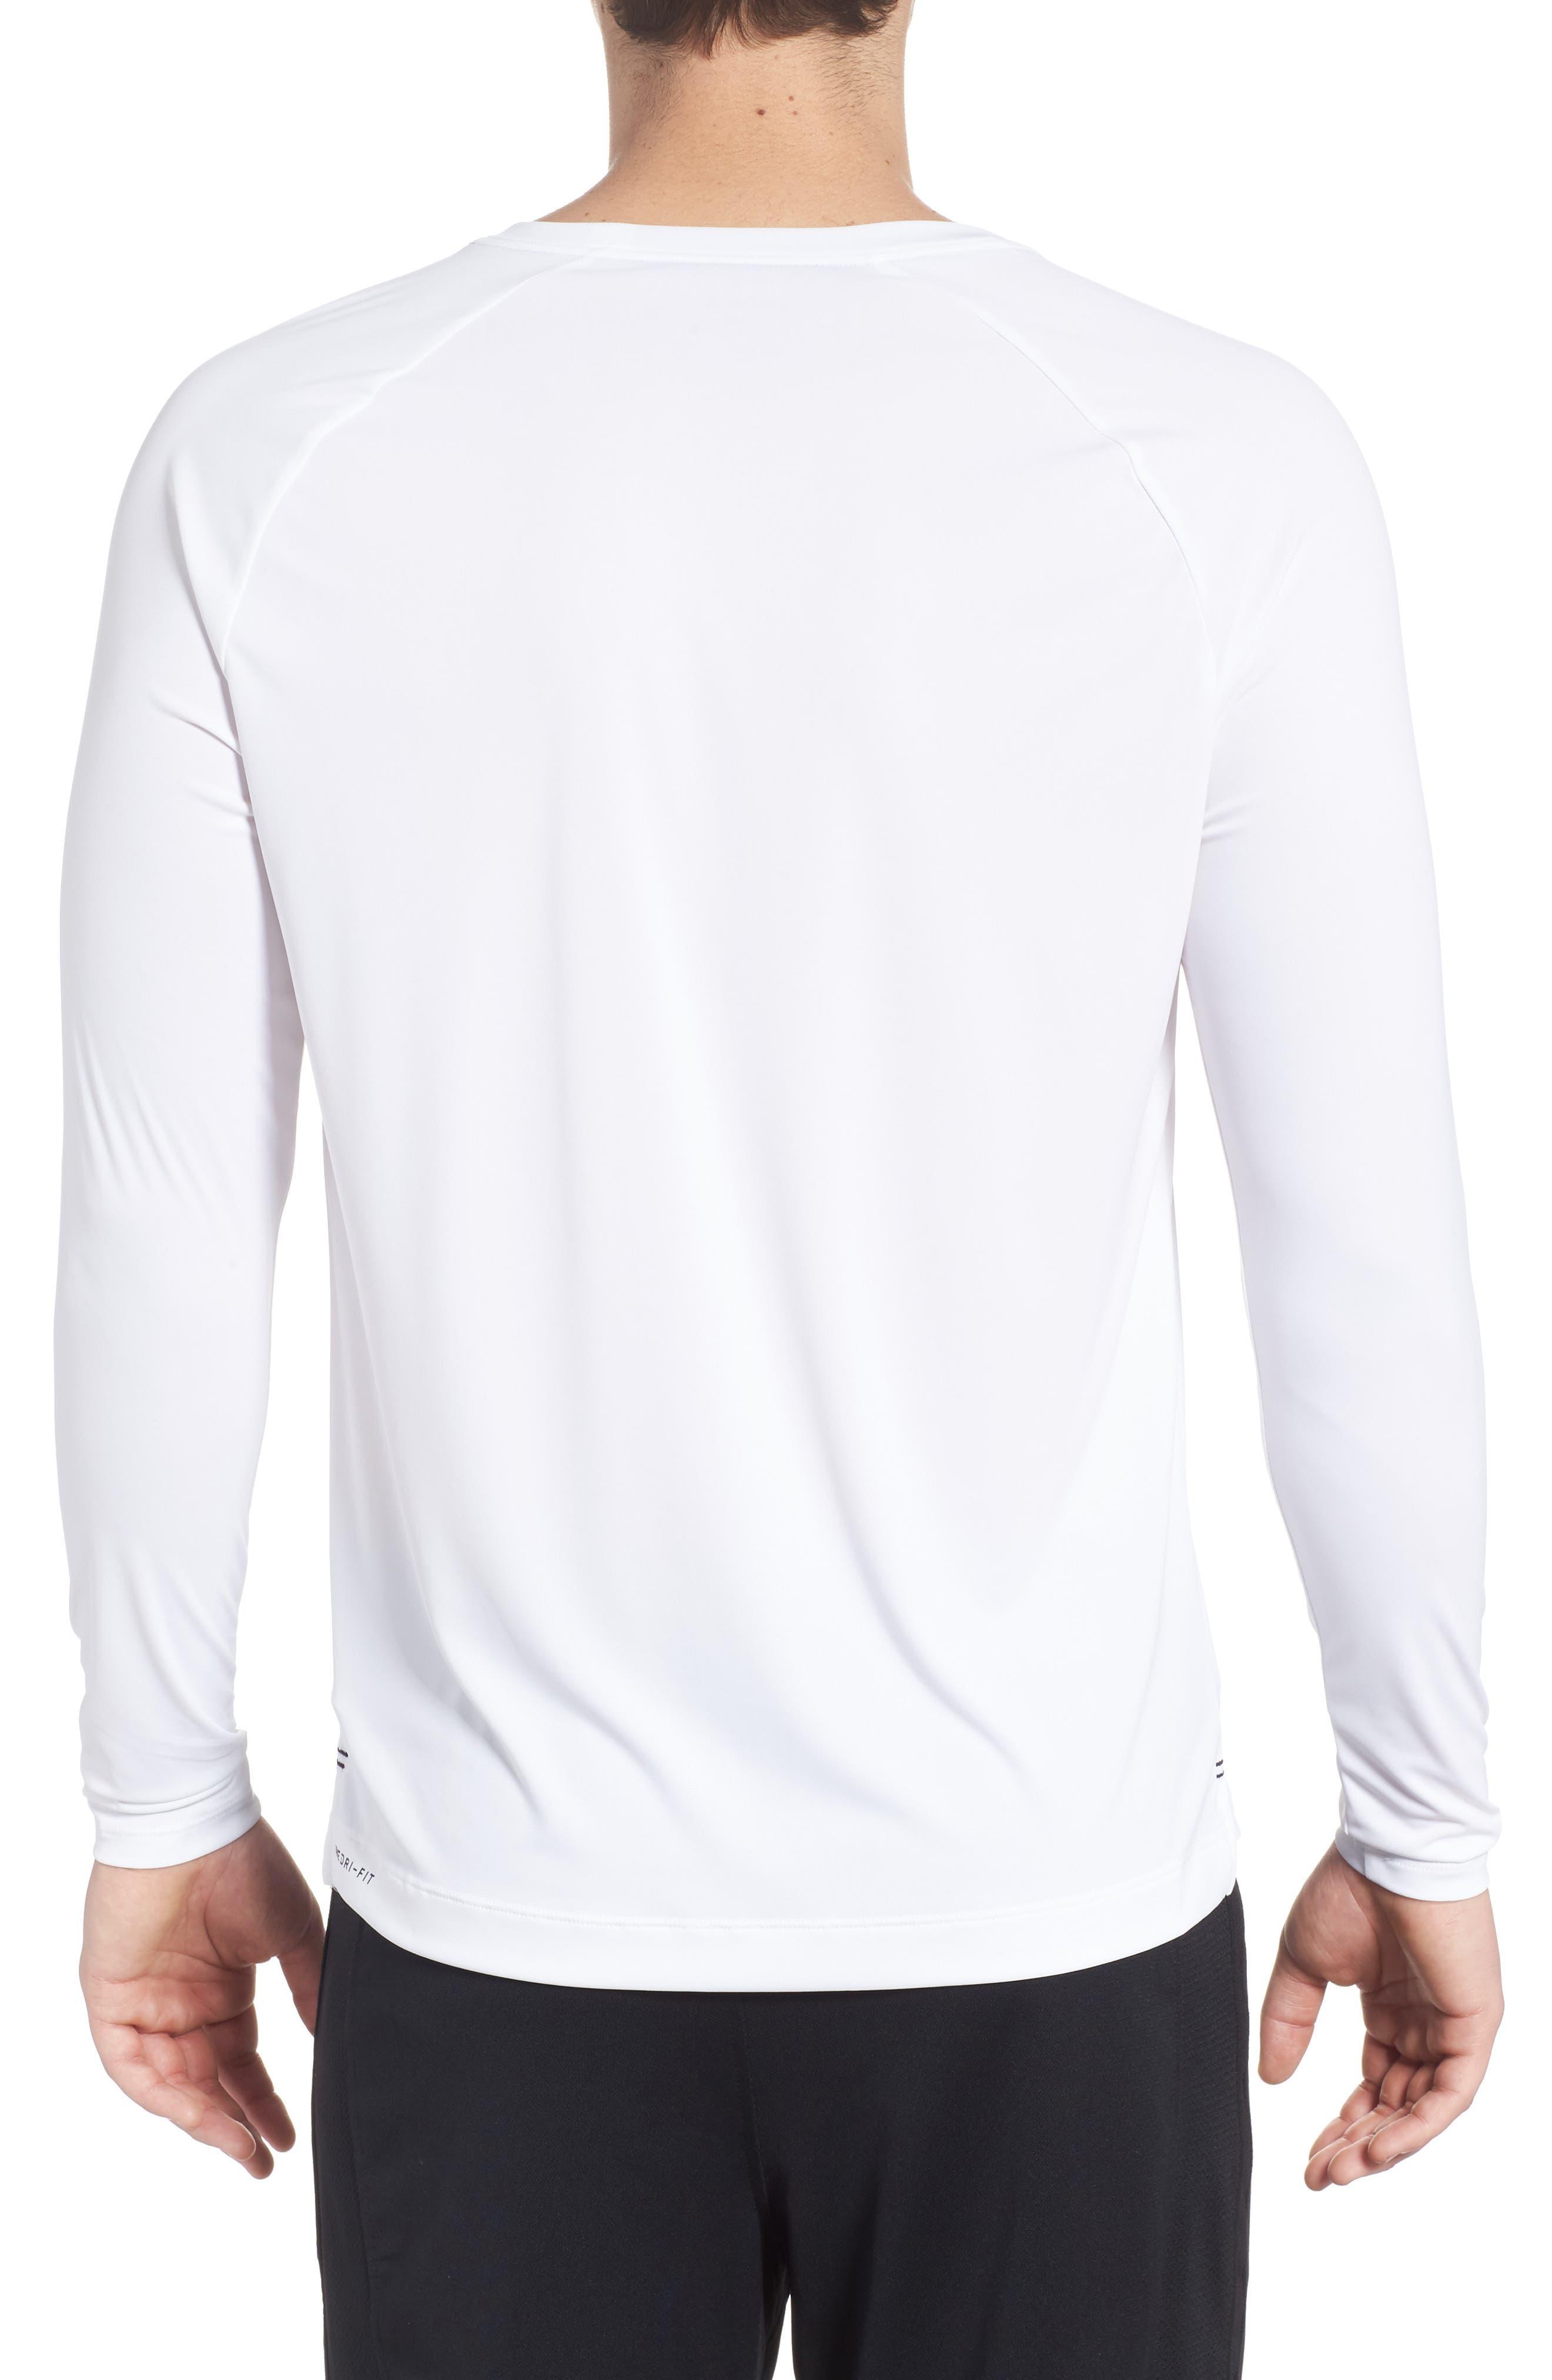 Icon Surf Shirt,                             Alternate thumbnail 2, color,                             White